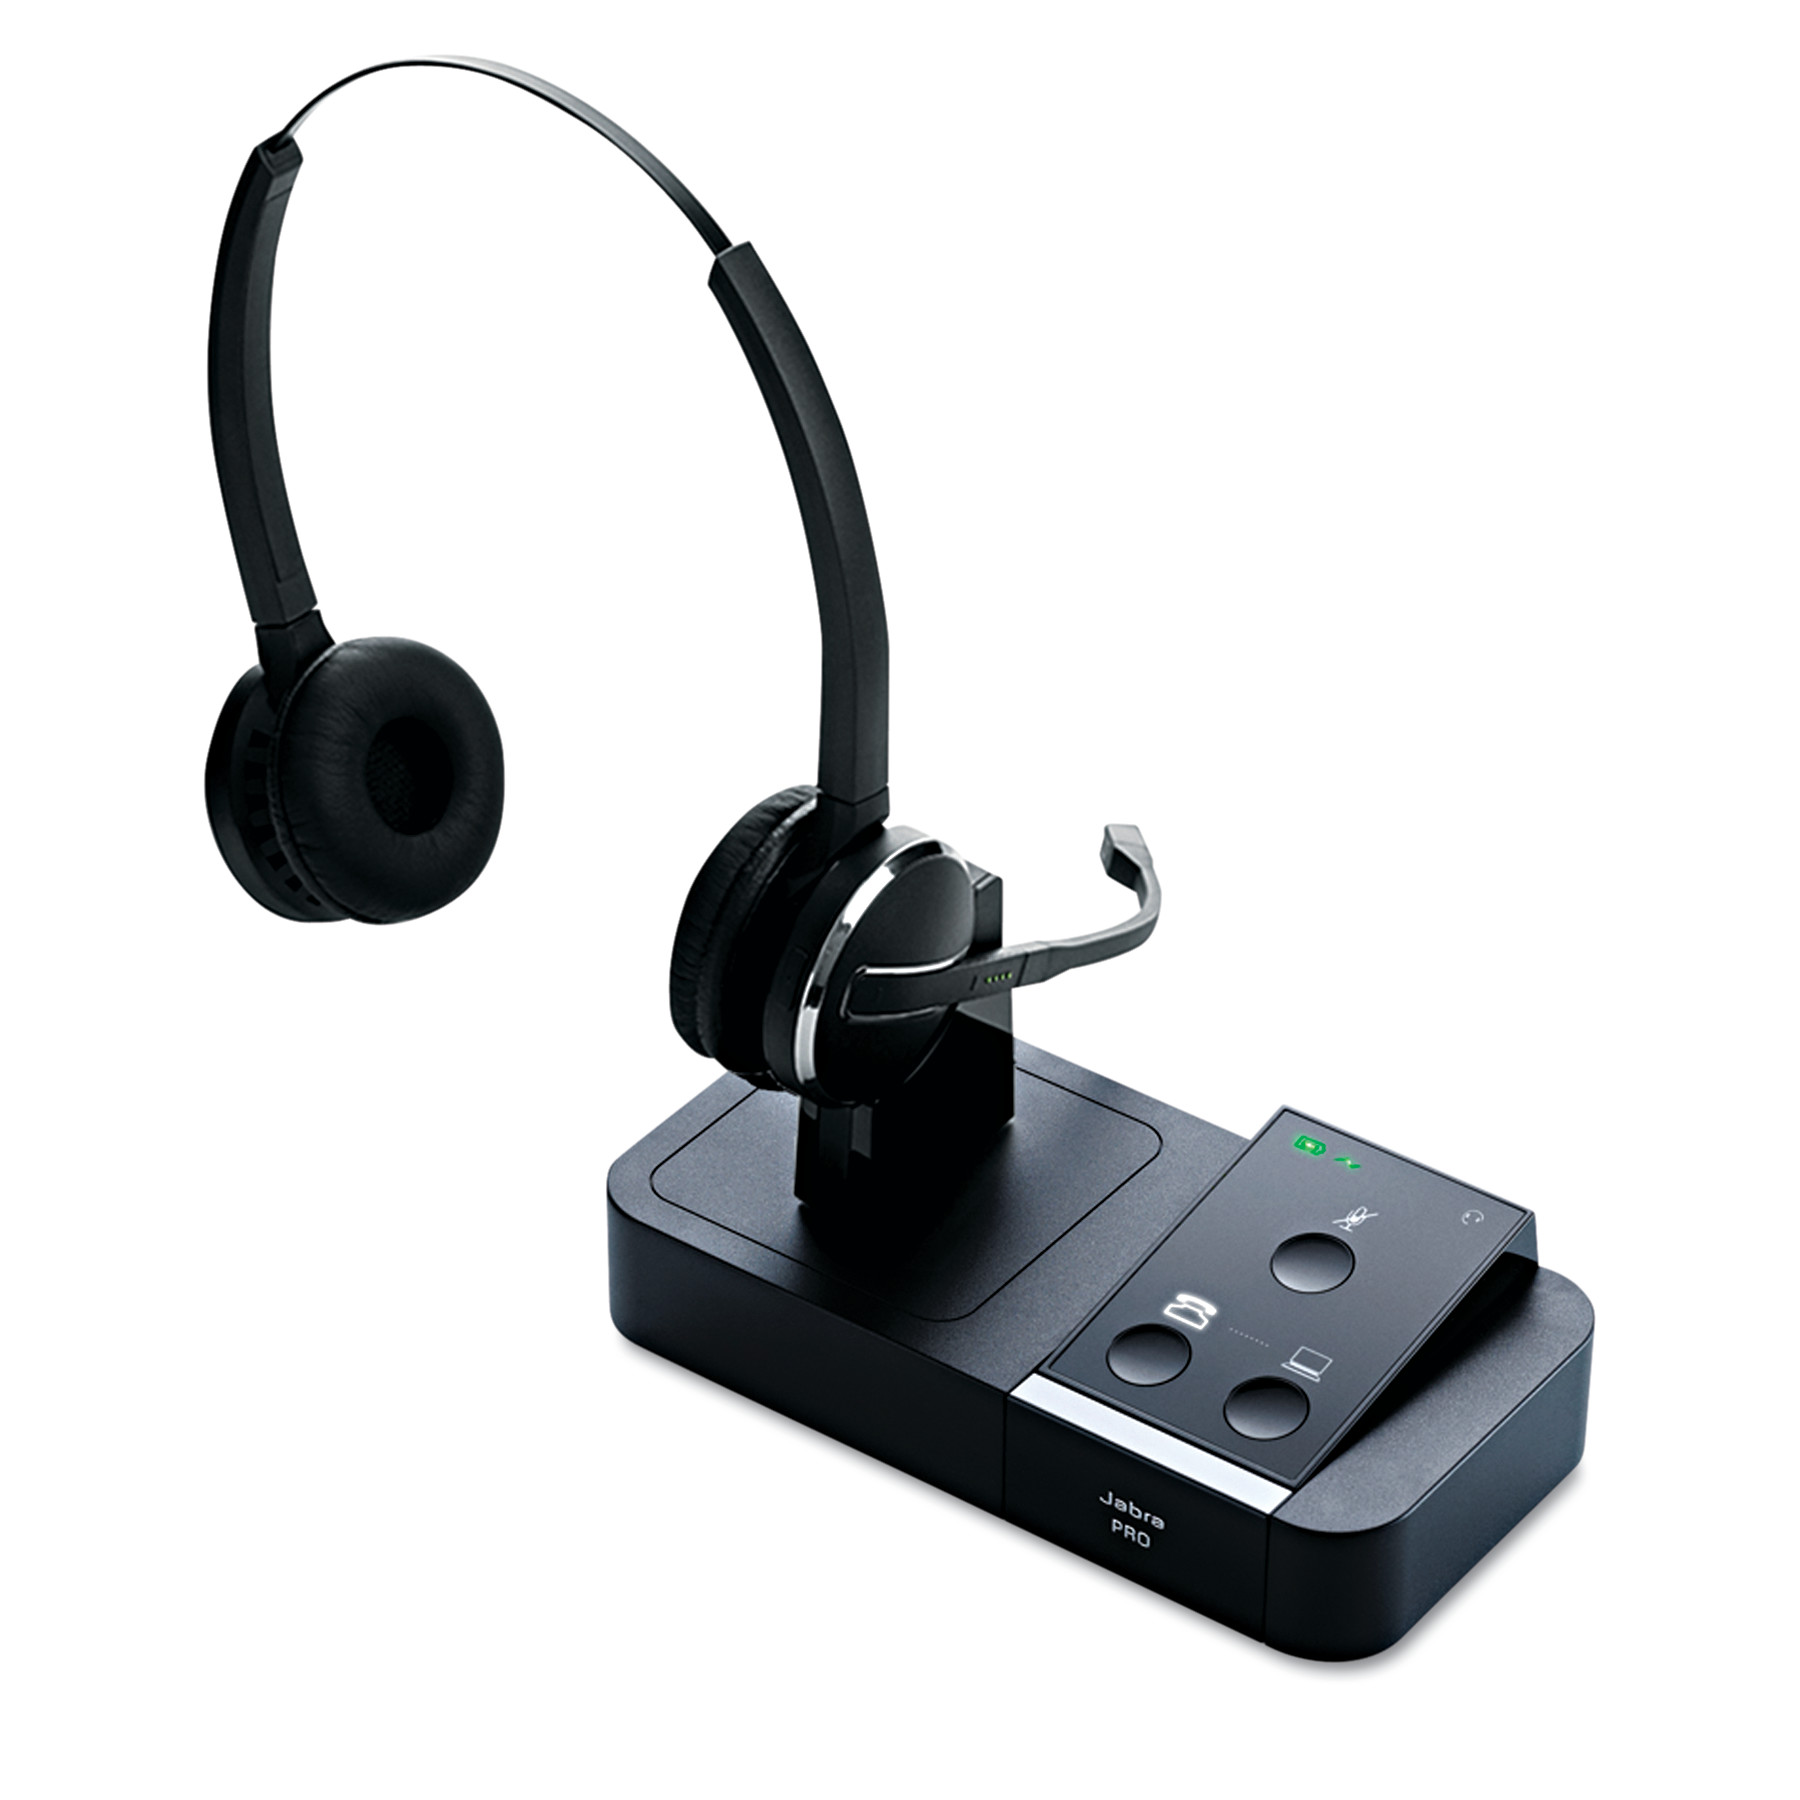 Jabra PRO 9450 Binaural Over-the-Head Wireless Headset